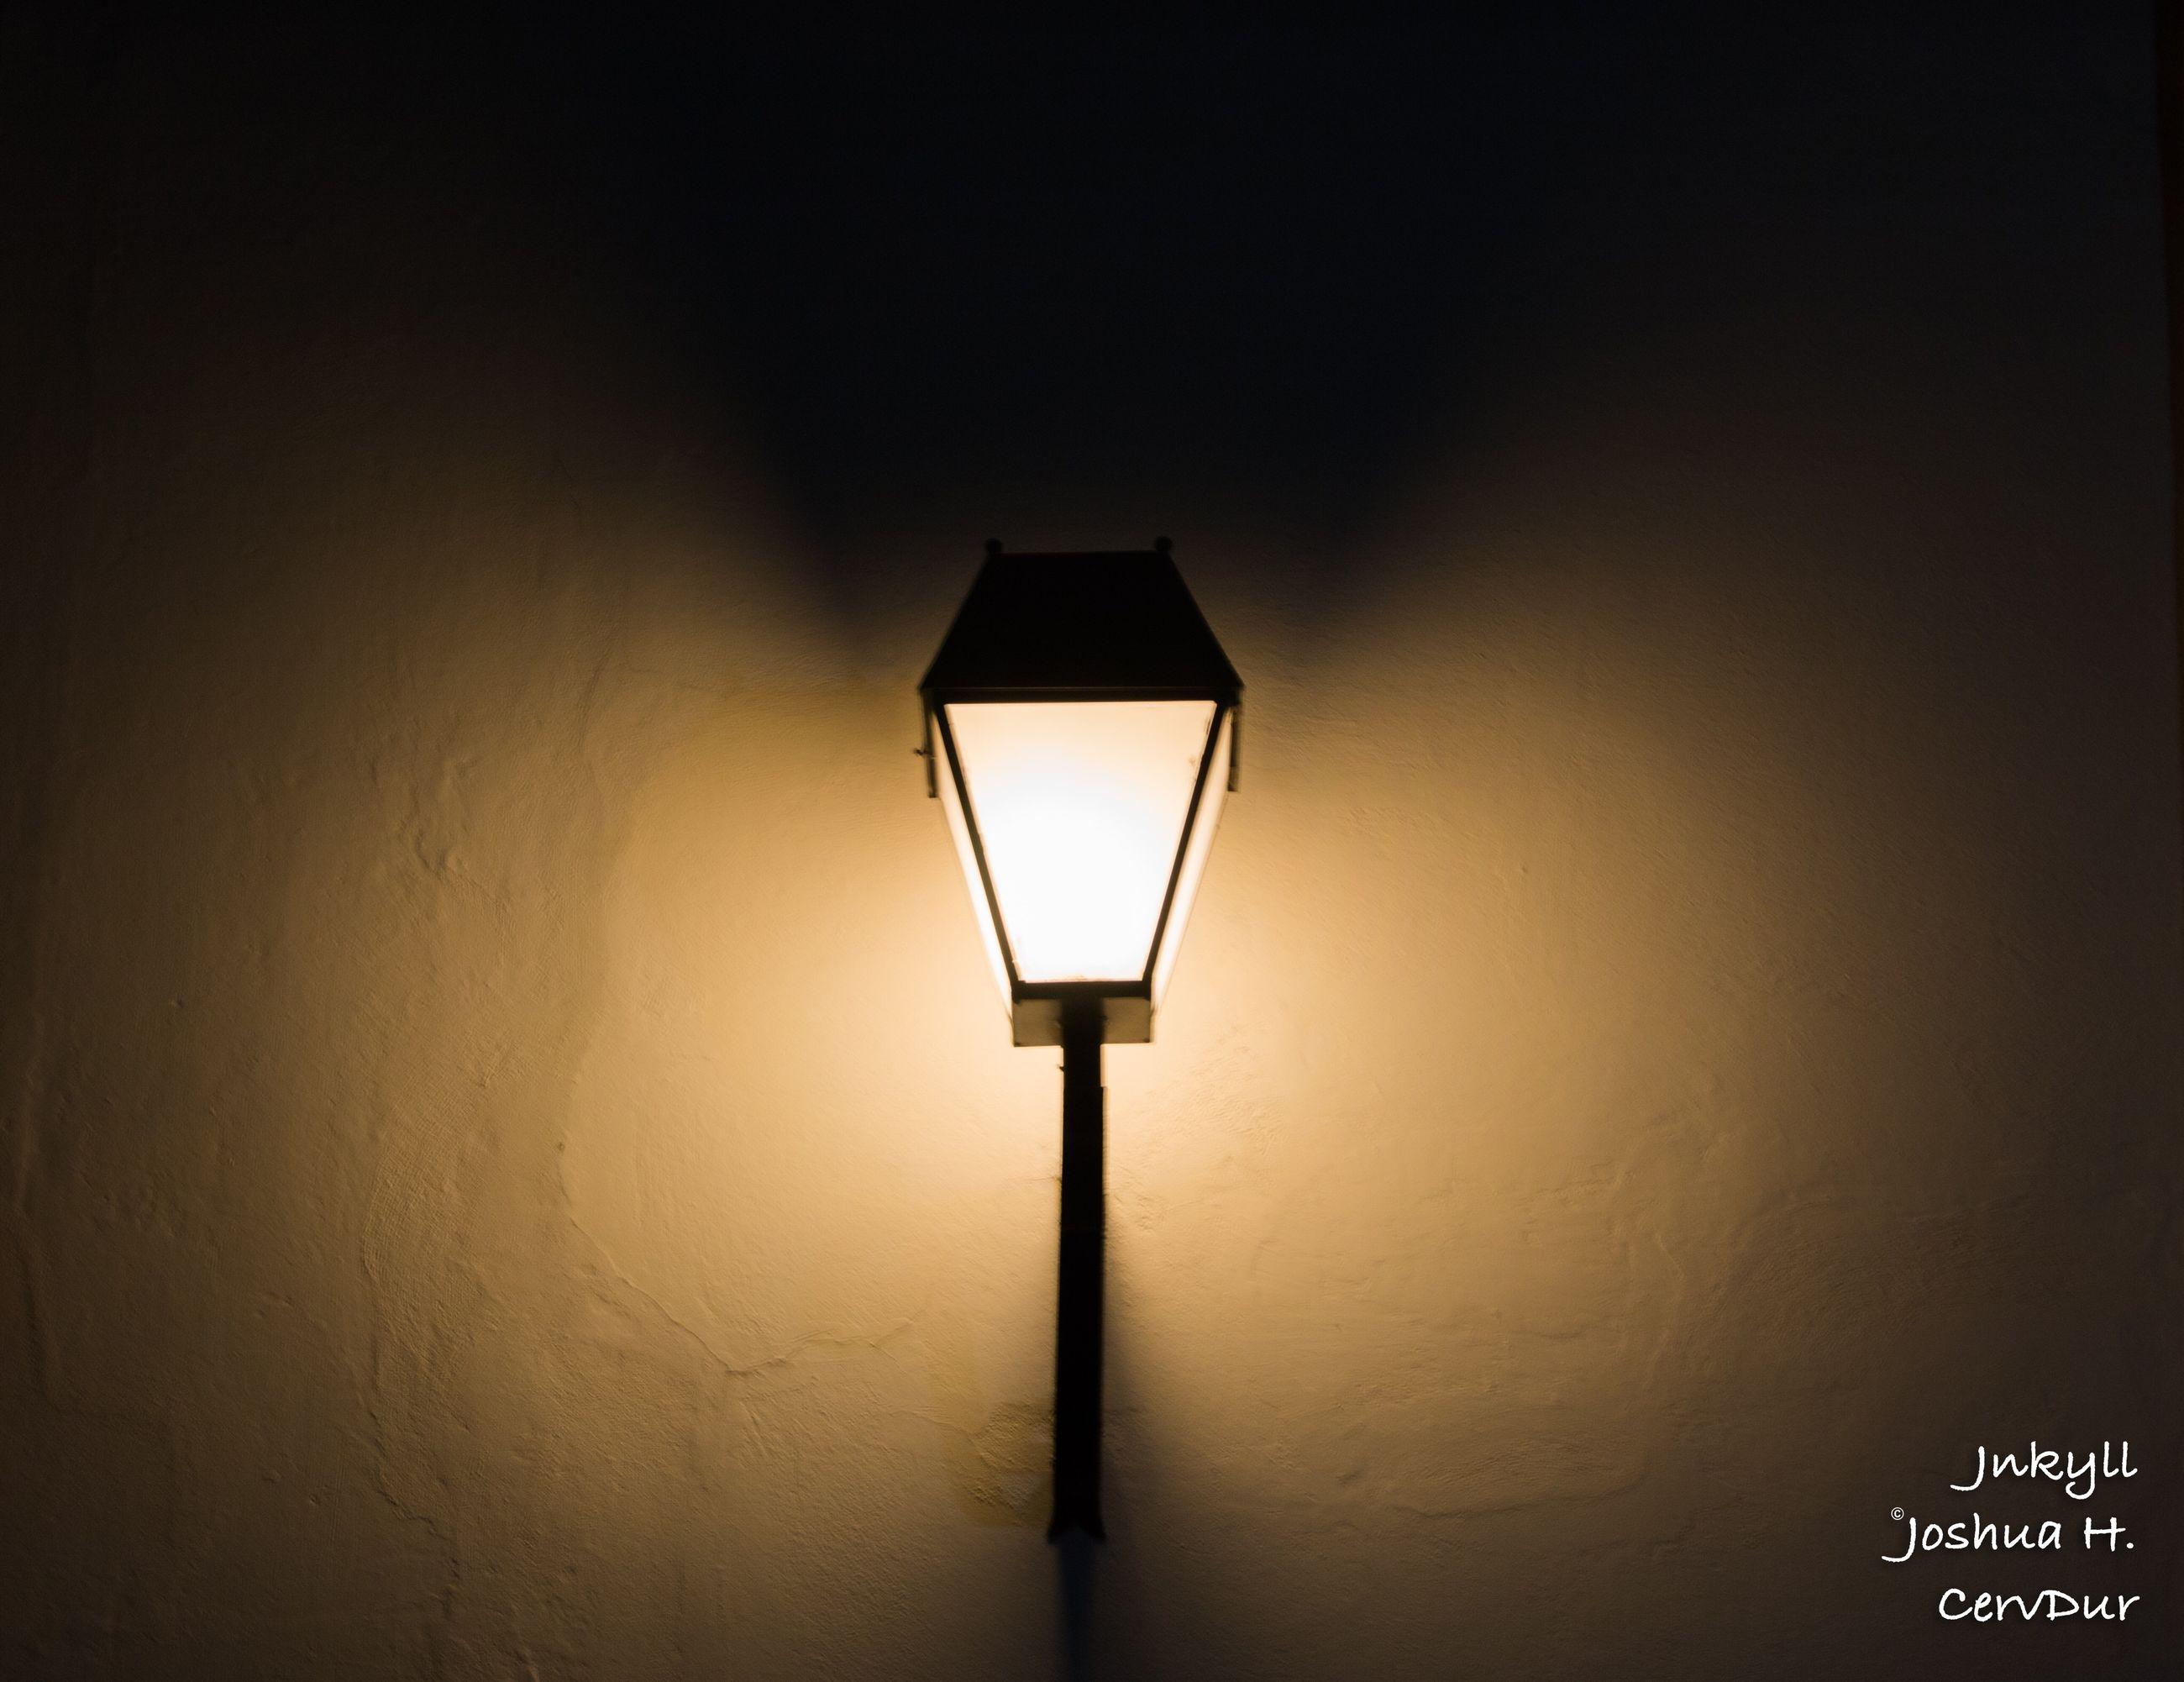 lighting equipment, illuminated, street light, electricity, light - natural phenomenon, electric light, close-up, high section, glowing, multi colored, lit, geometric shape, circle, no people